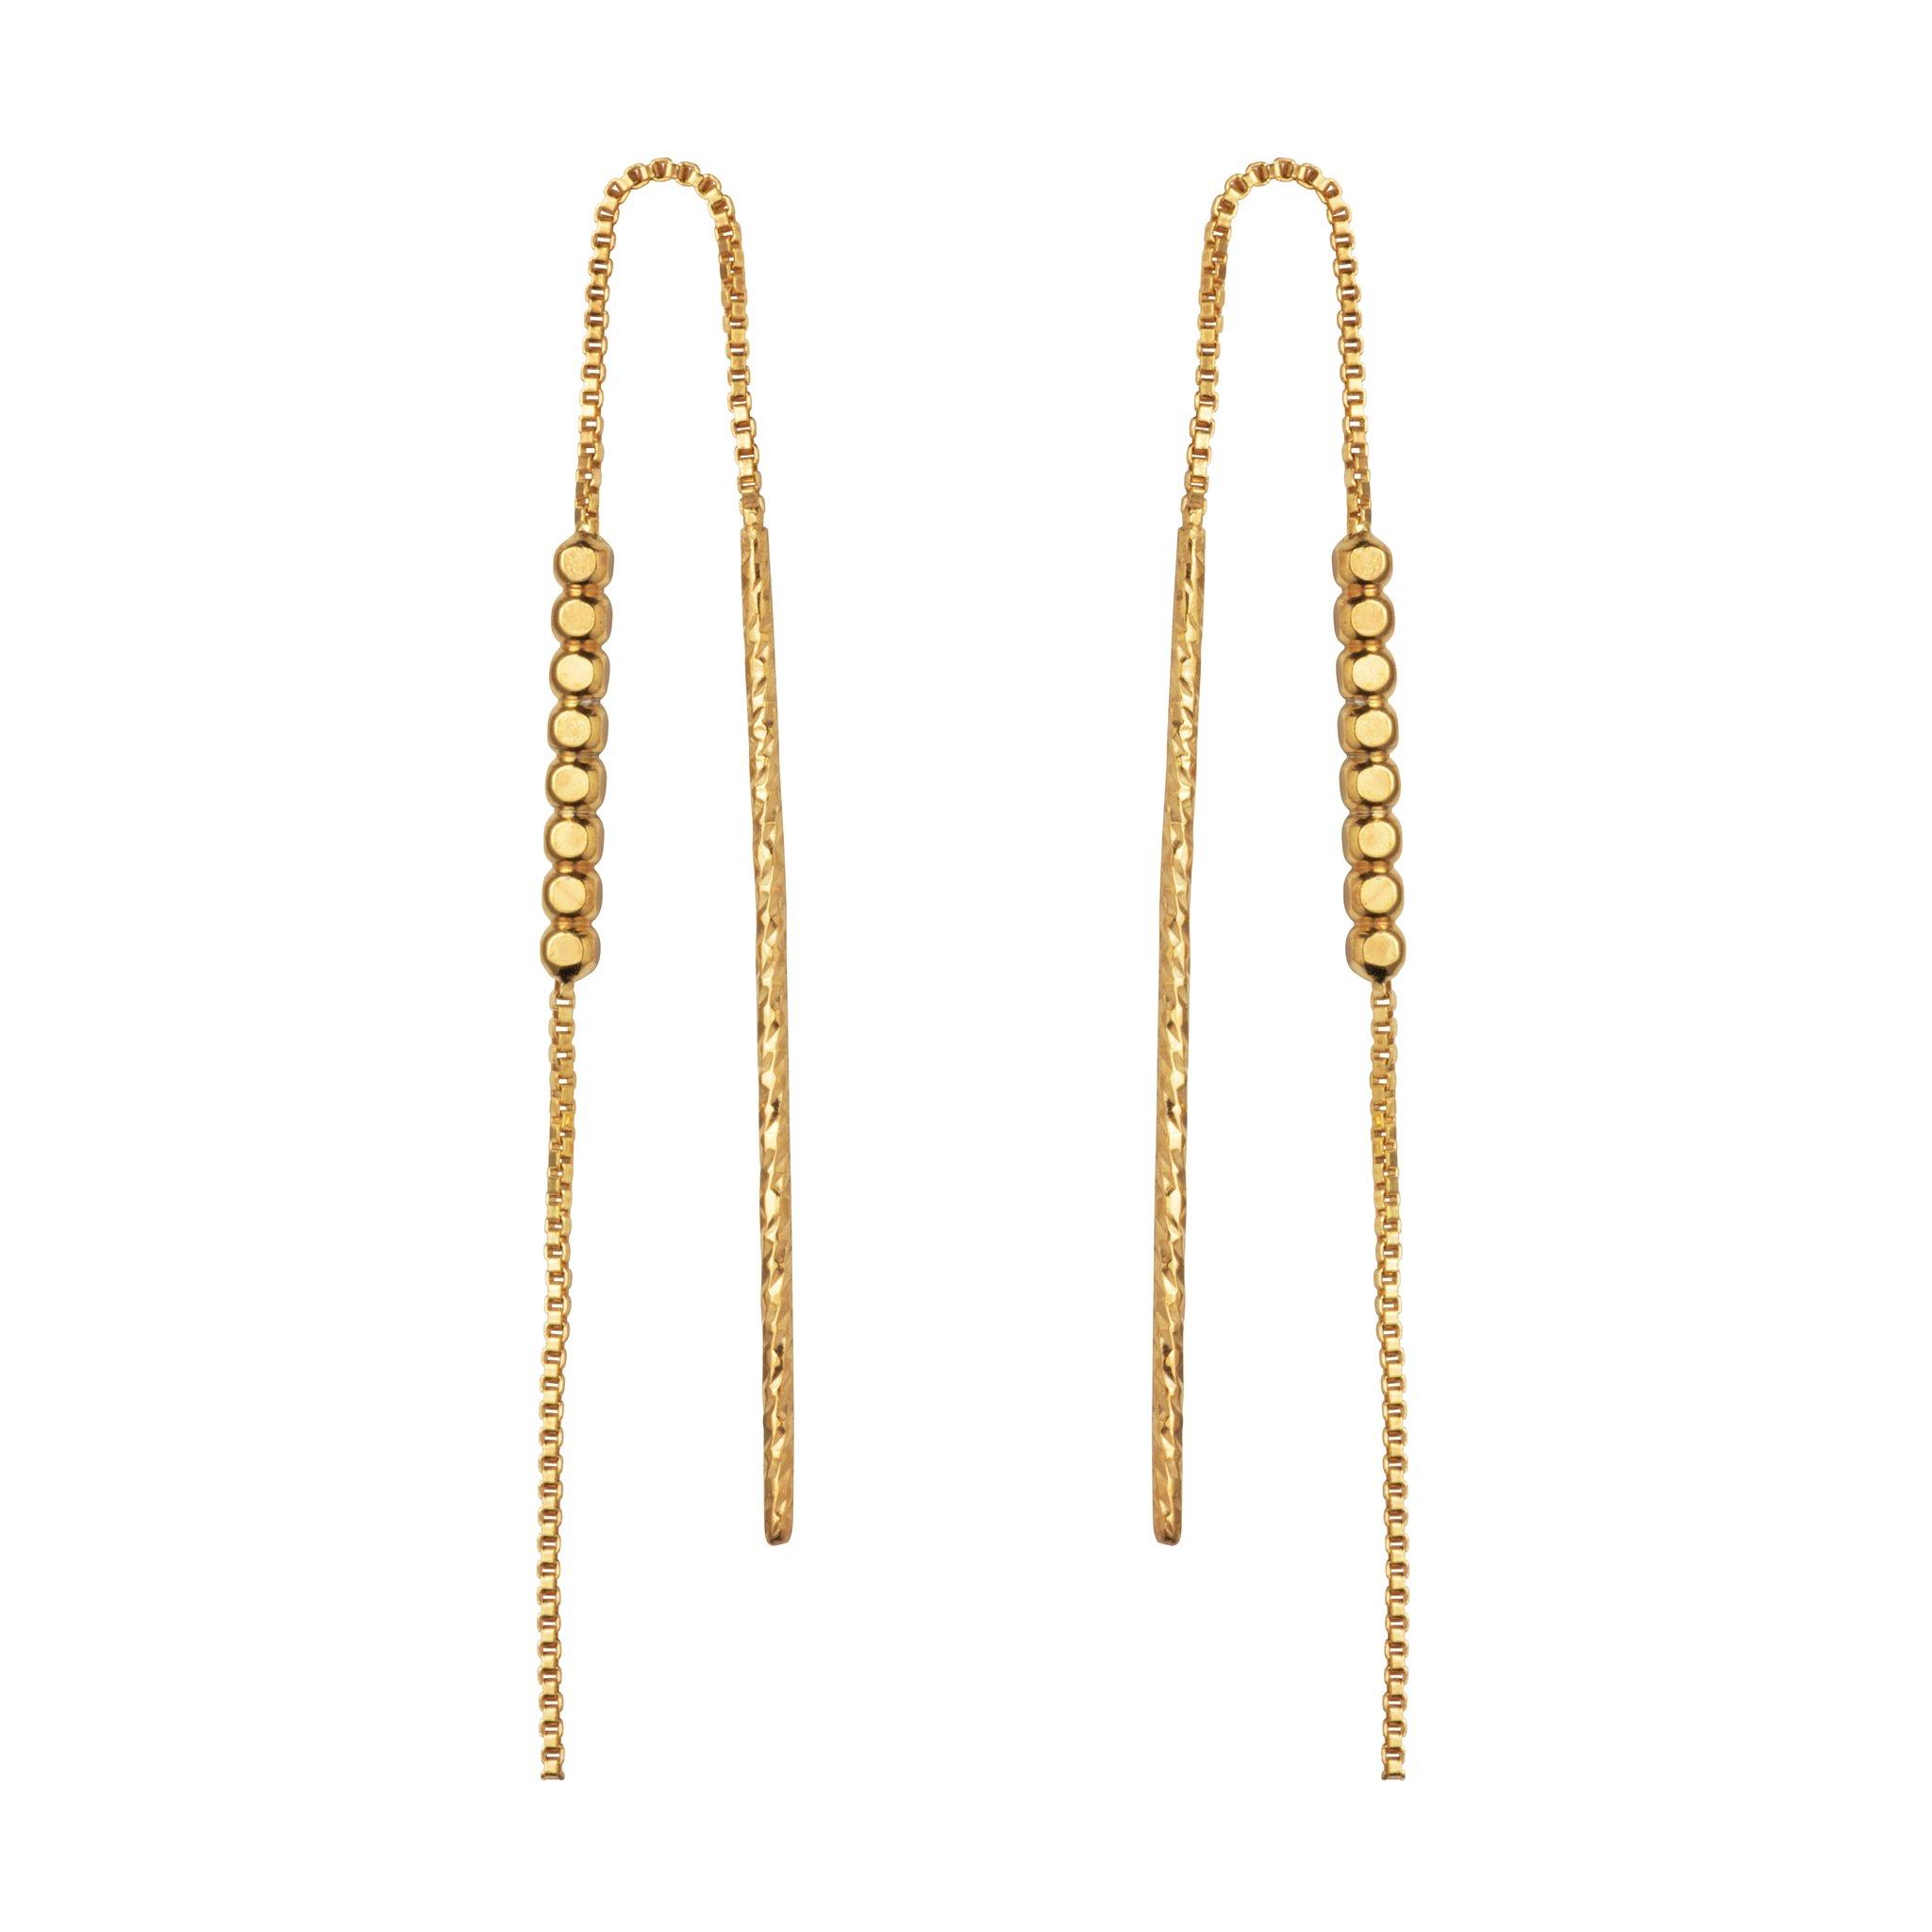 mini-vincent-threaders-gold-vermeil-pair.